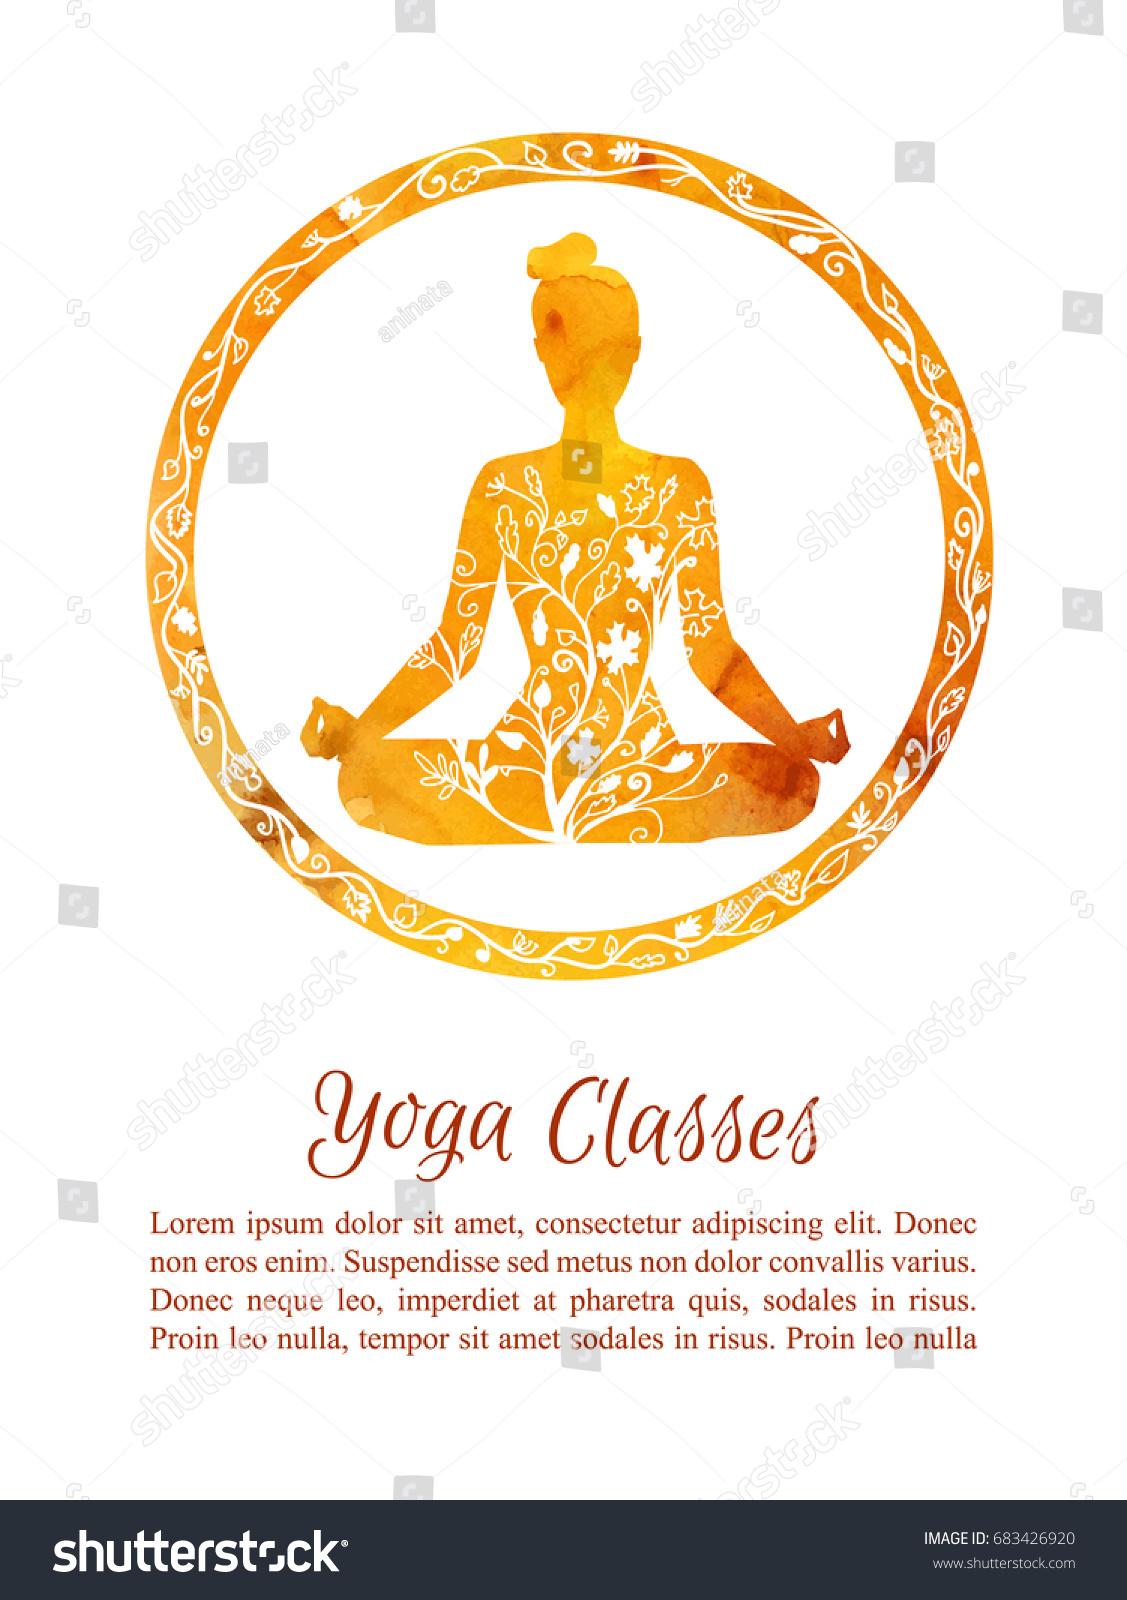 Card Flyer Template Autumn Yoga Classes Stock Photo (Photo, Vector ...